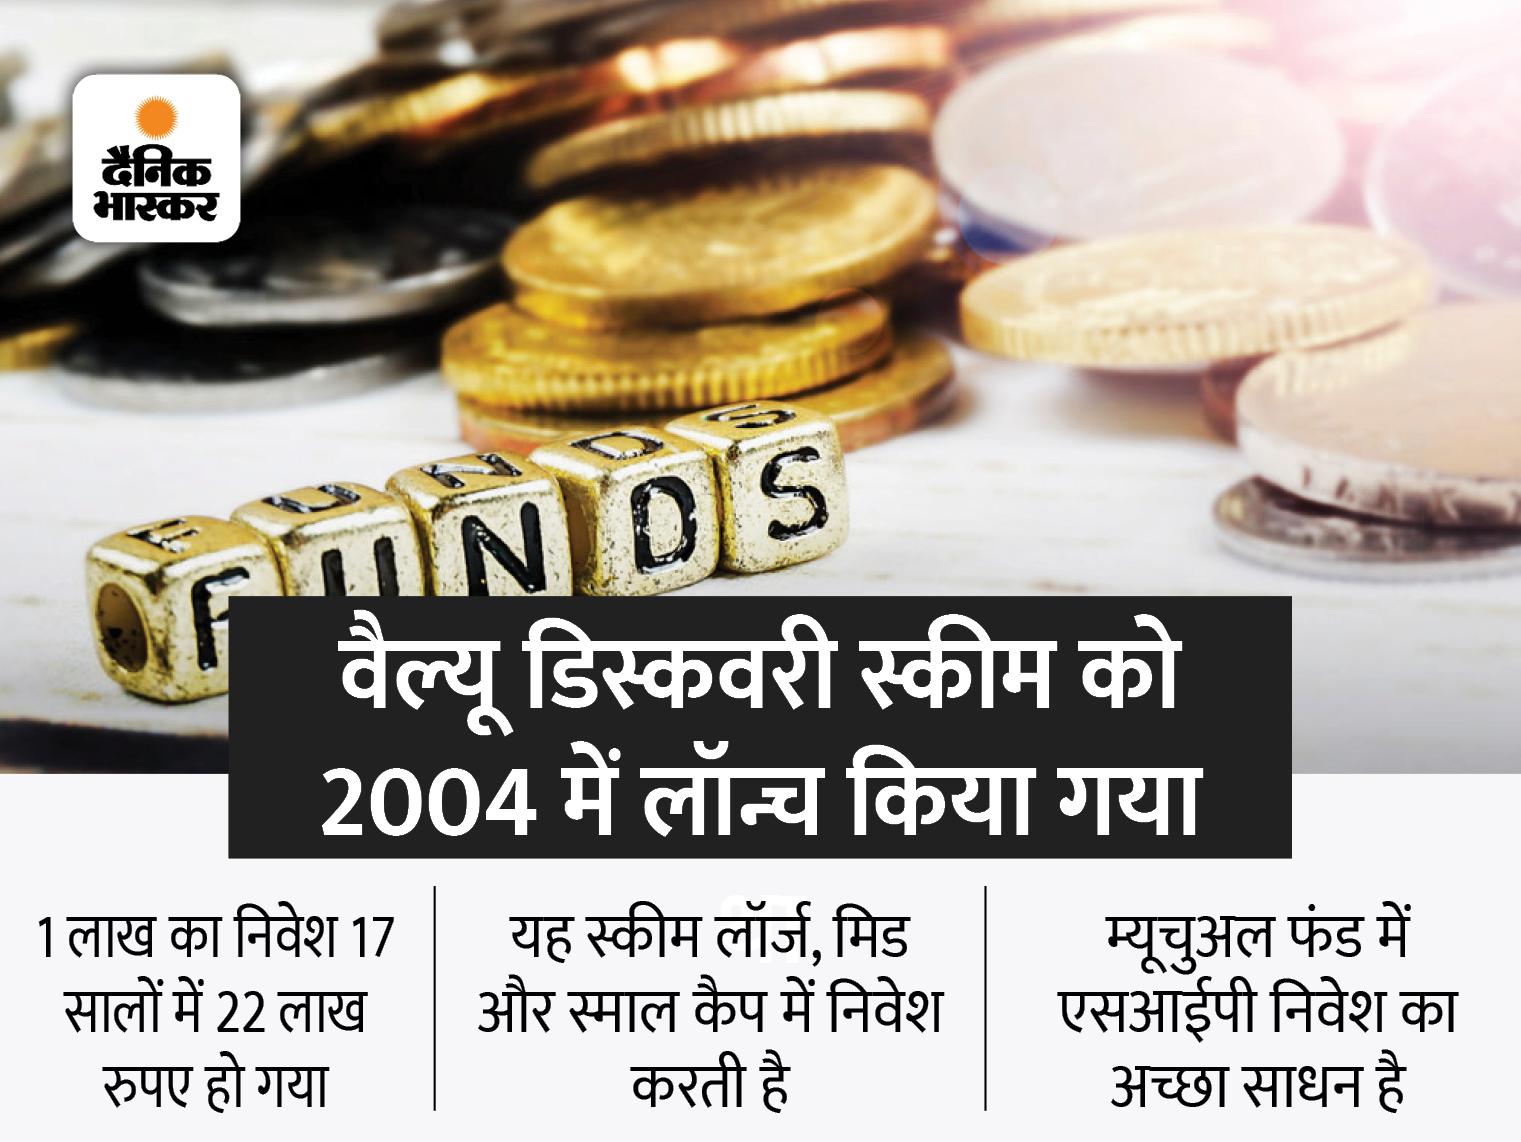 10 हजार रुपए महीने का SIP बना 1.08 करोड़ रुपए, ICICI प्रूडेंशियल की वैल्यू डिस्कवरी स्कीम का 17.5% रिटर्न|बिजनेस,Business - Dainik Bhaskar